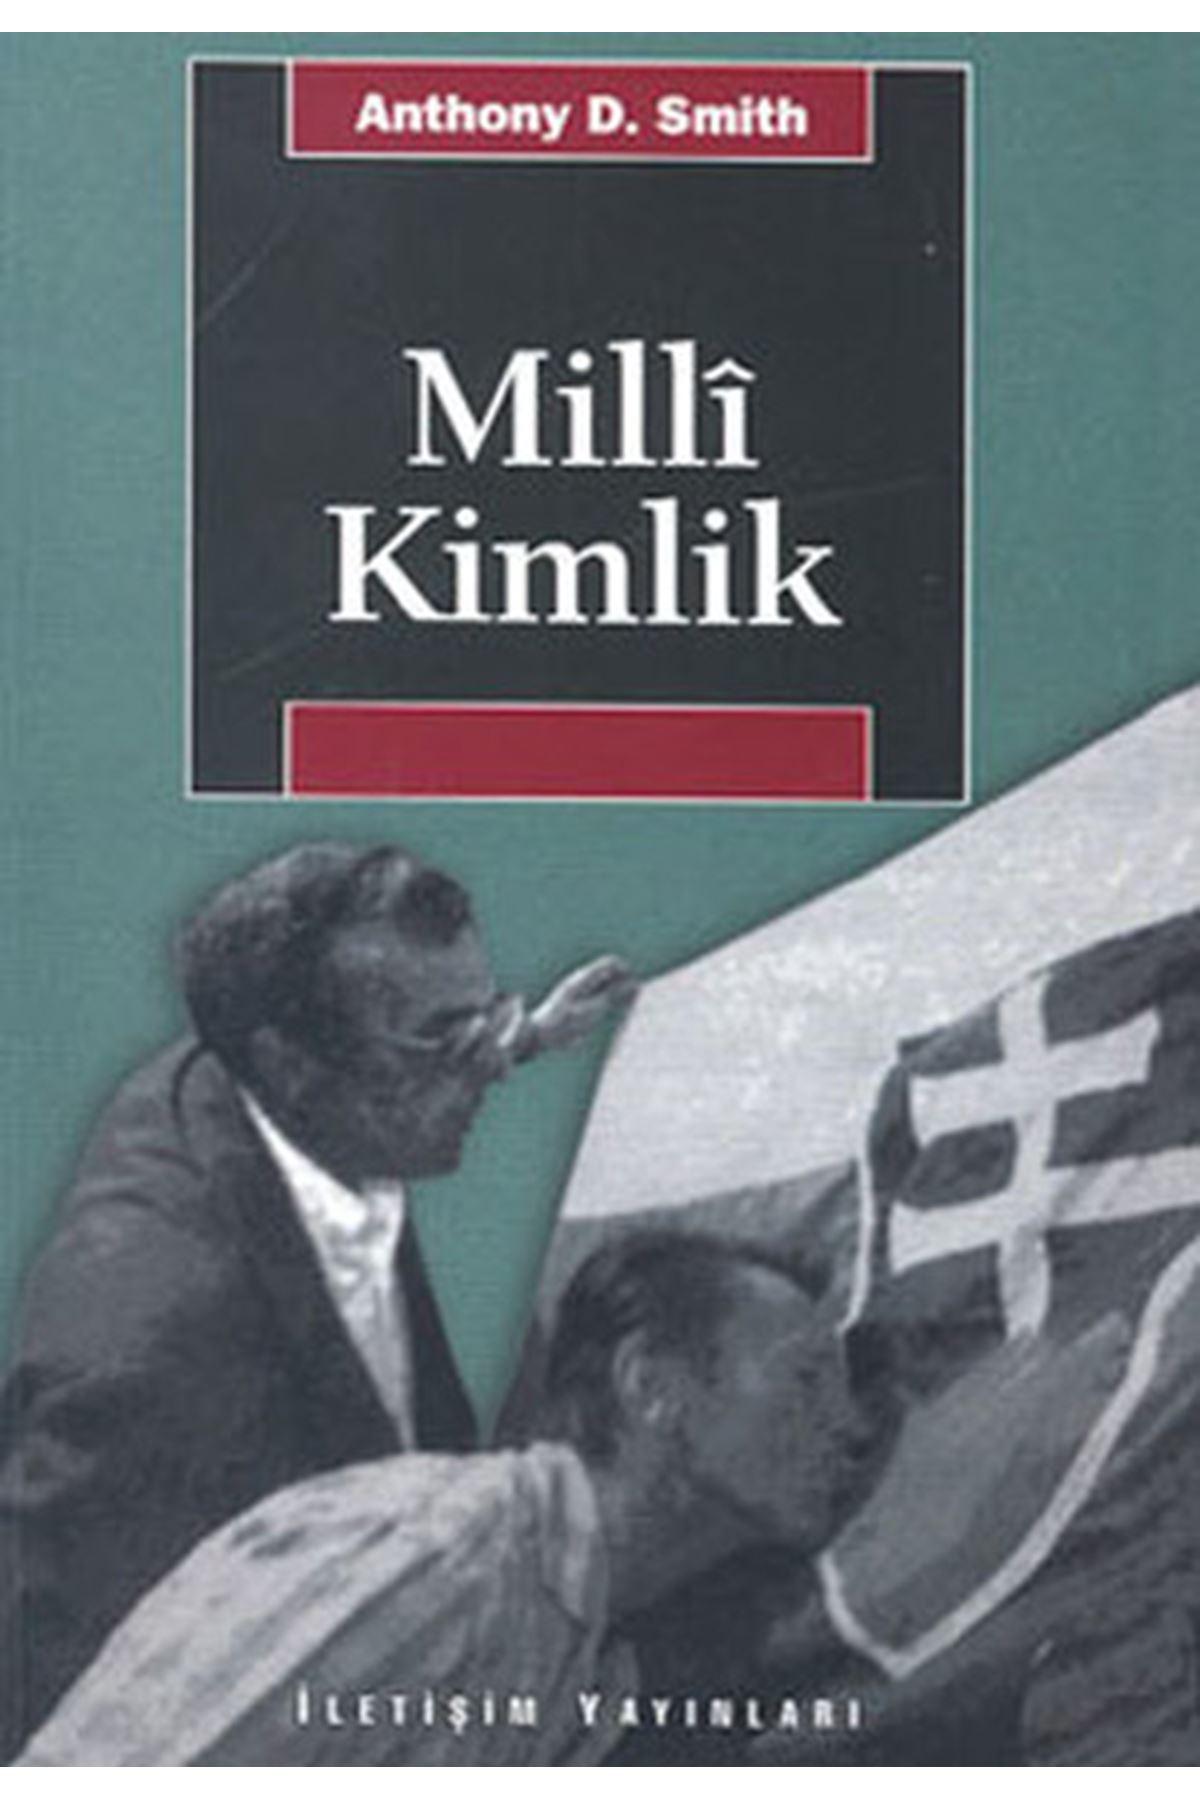 ANTHONY D. SMİTH - MİLLİ KİMLİK